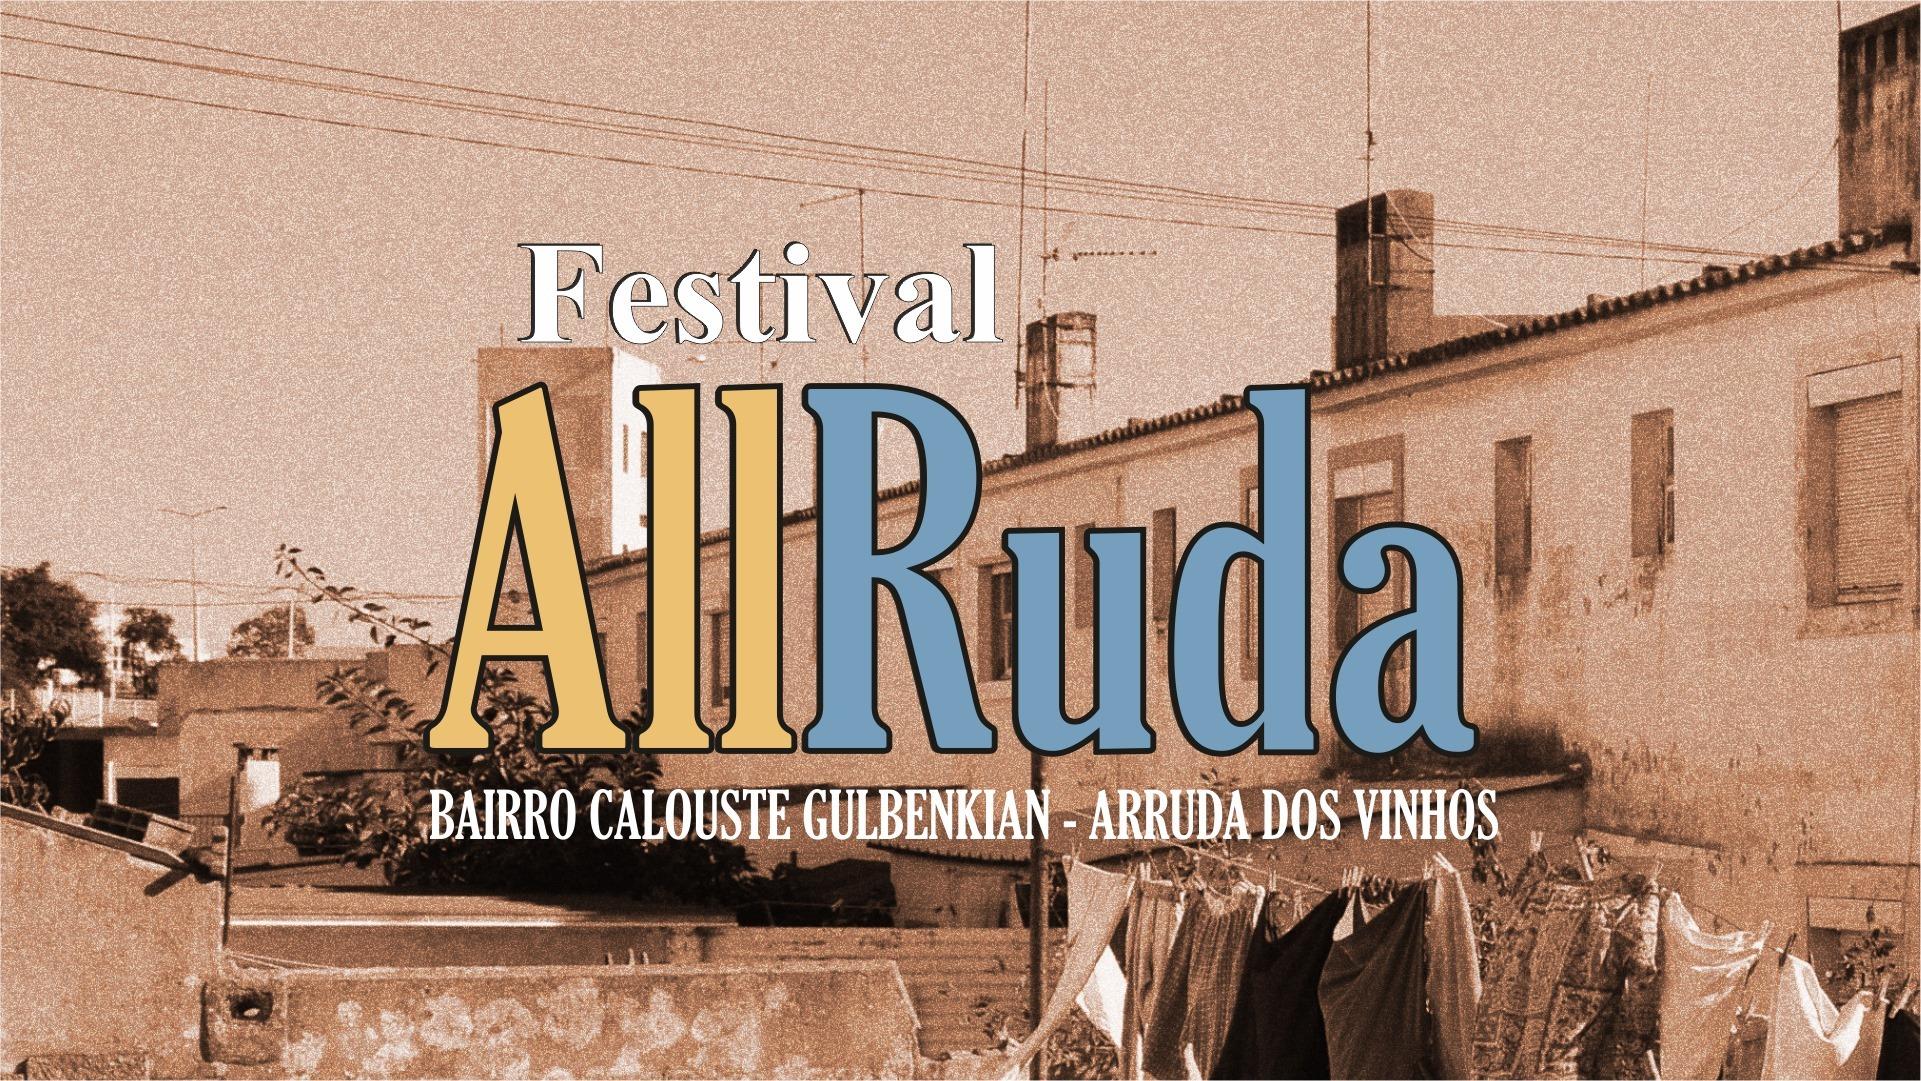 Festiva AllRuda